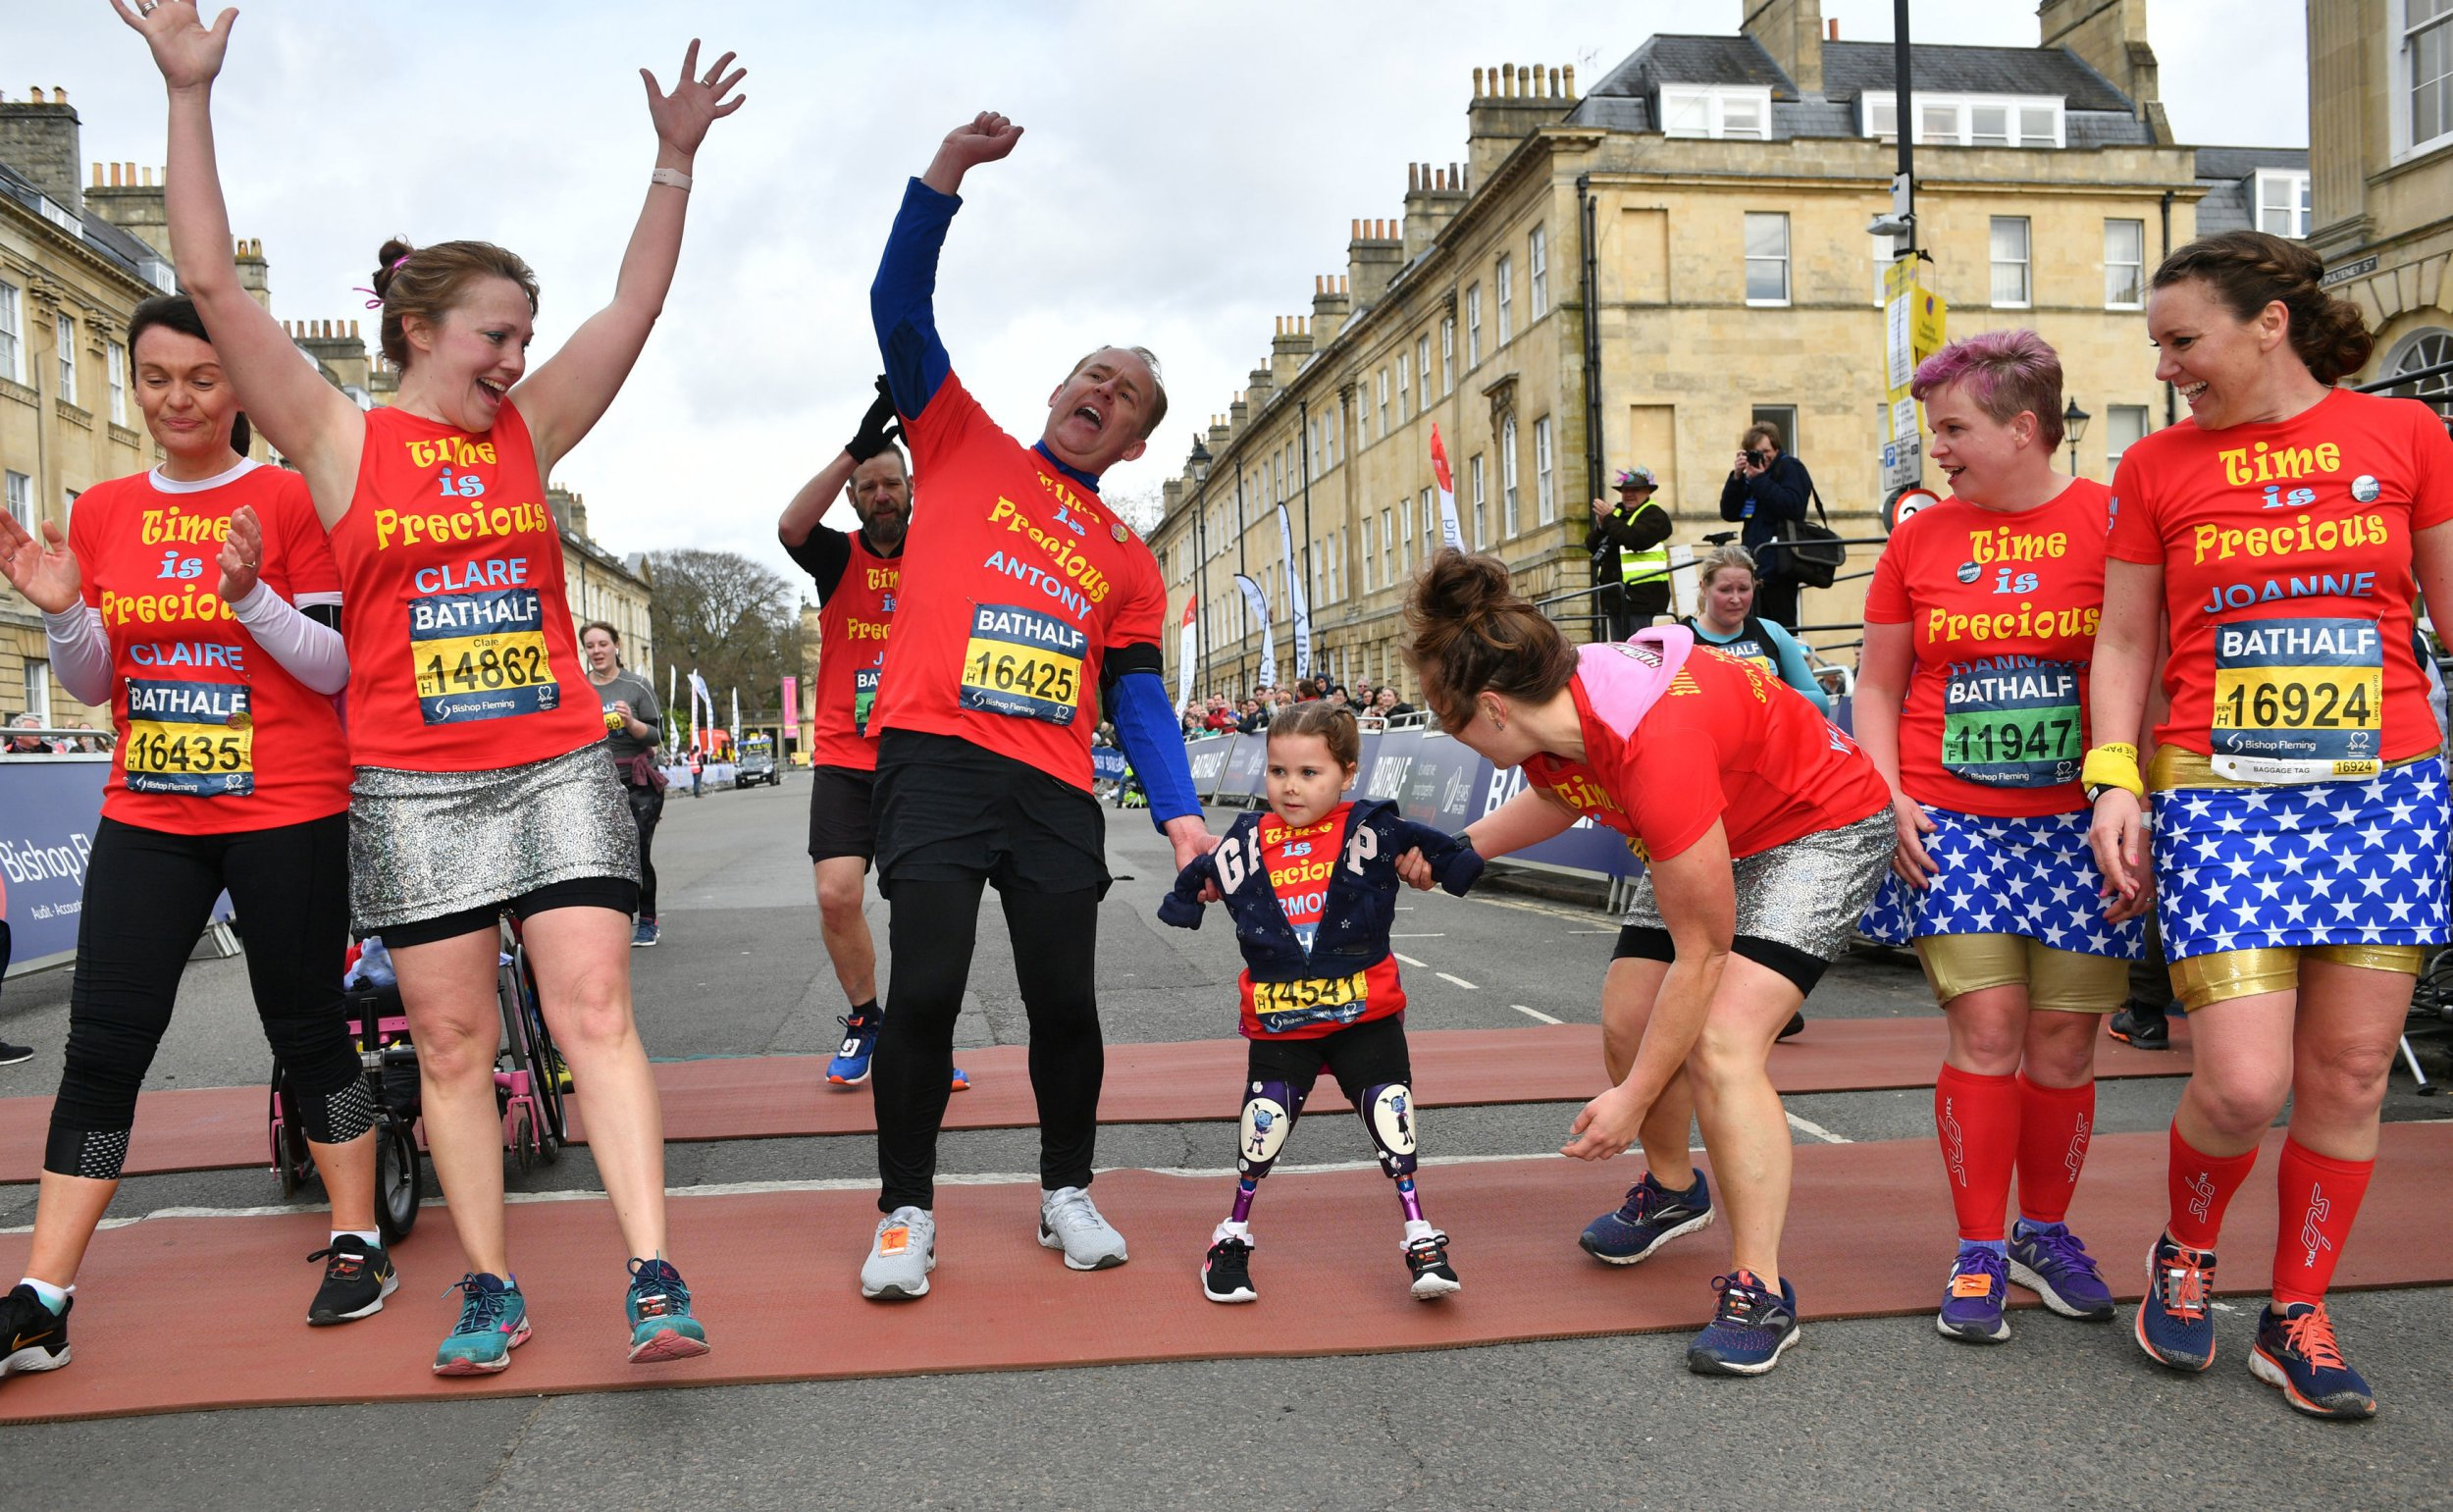 Girl, 5, who lost all her limbs to meningitis finishes half-marathon